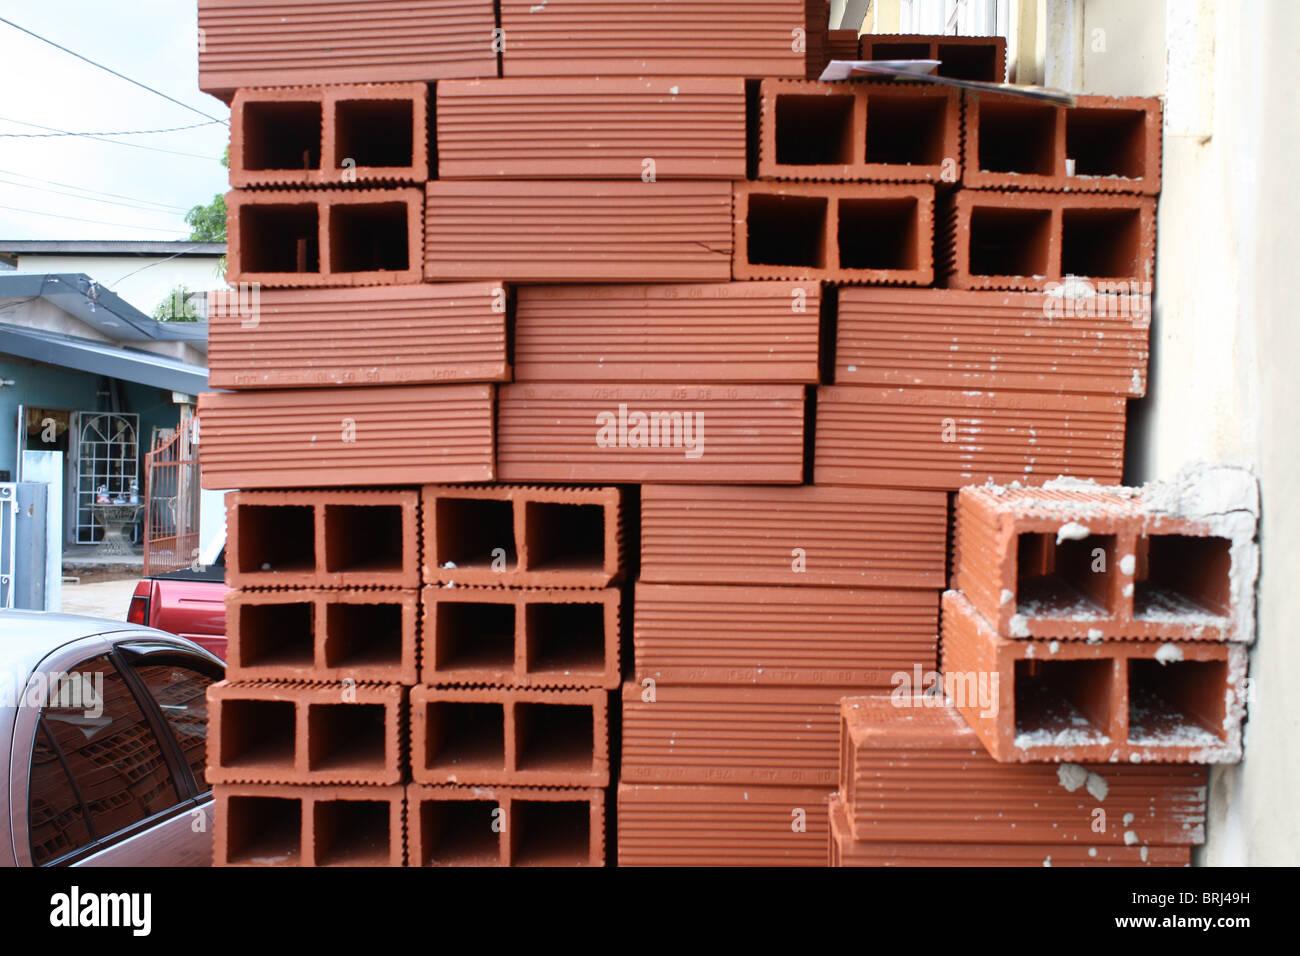 Red Bricks Building material - Stock Image